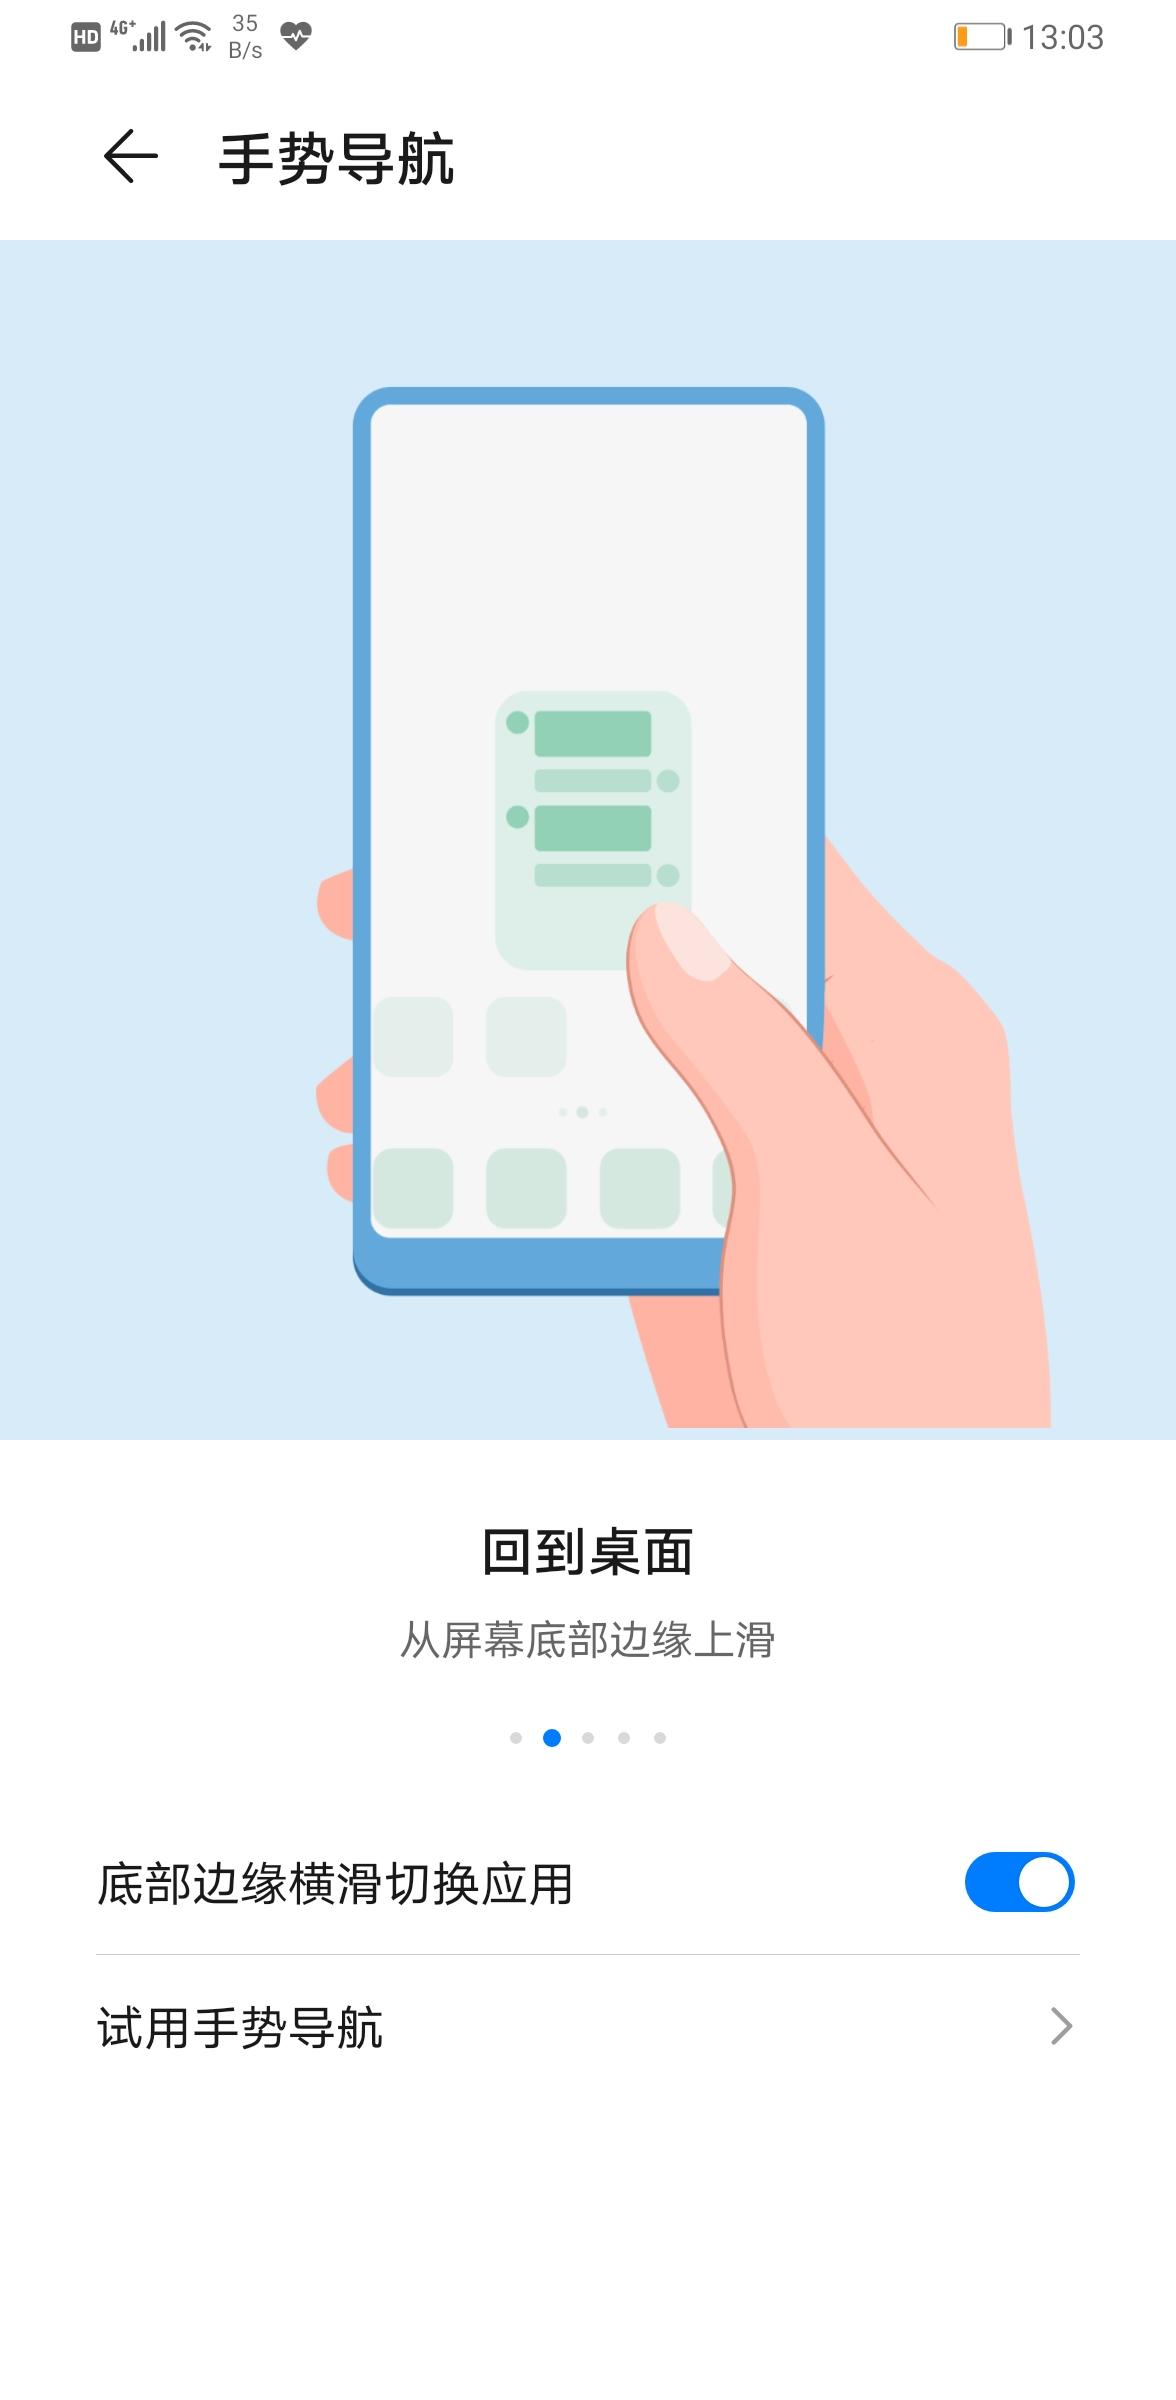 Screenshot_20200507_130312_com.android.settings.jpg